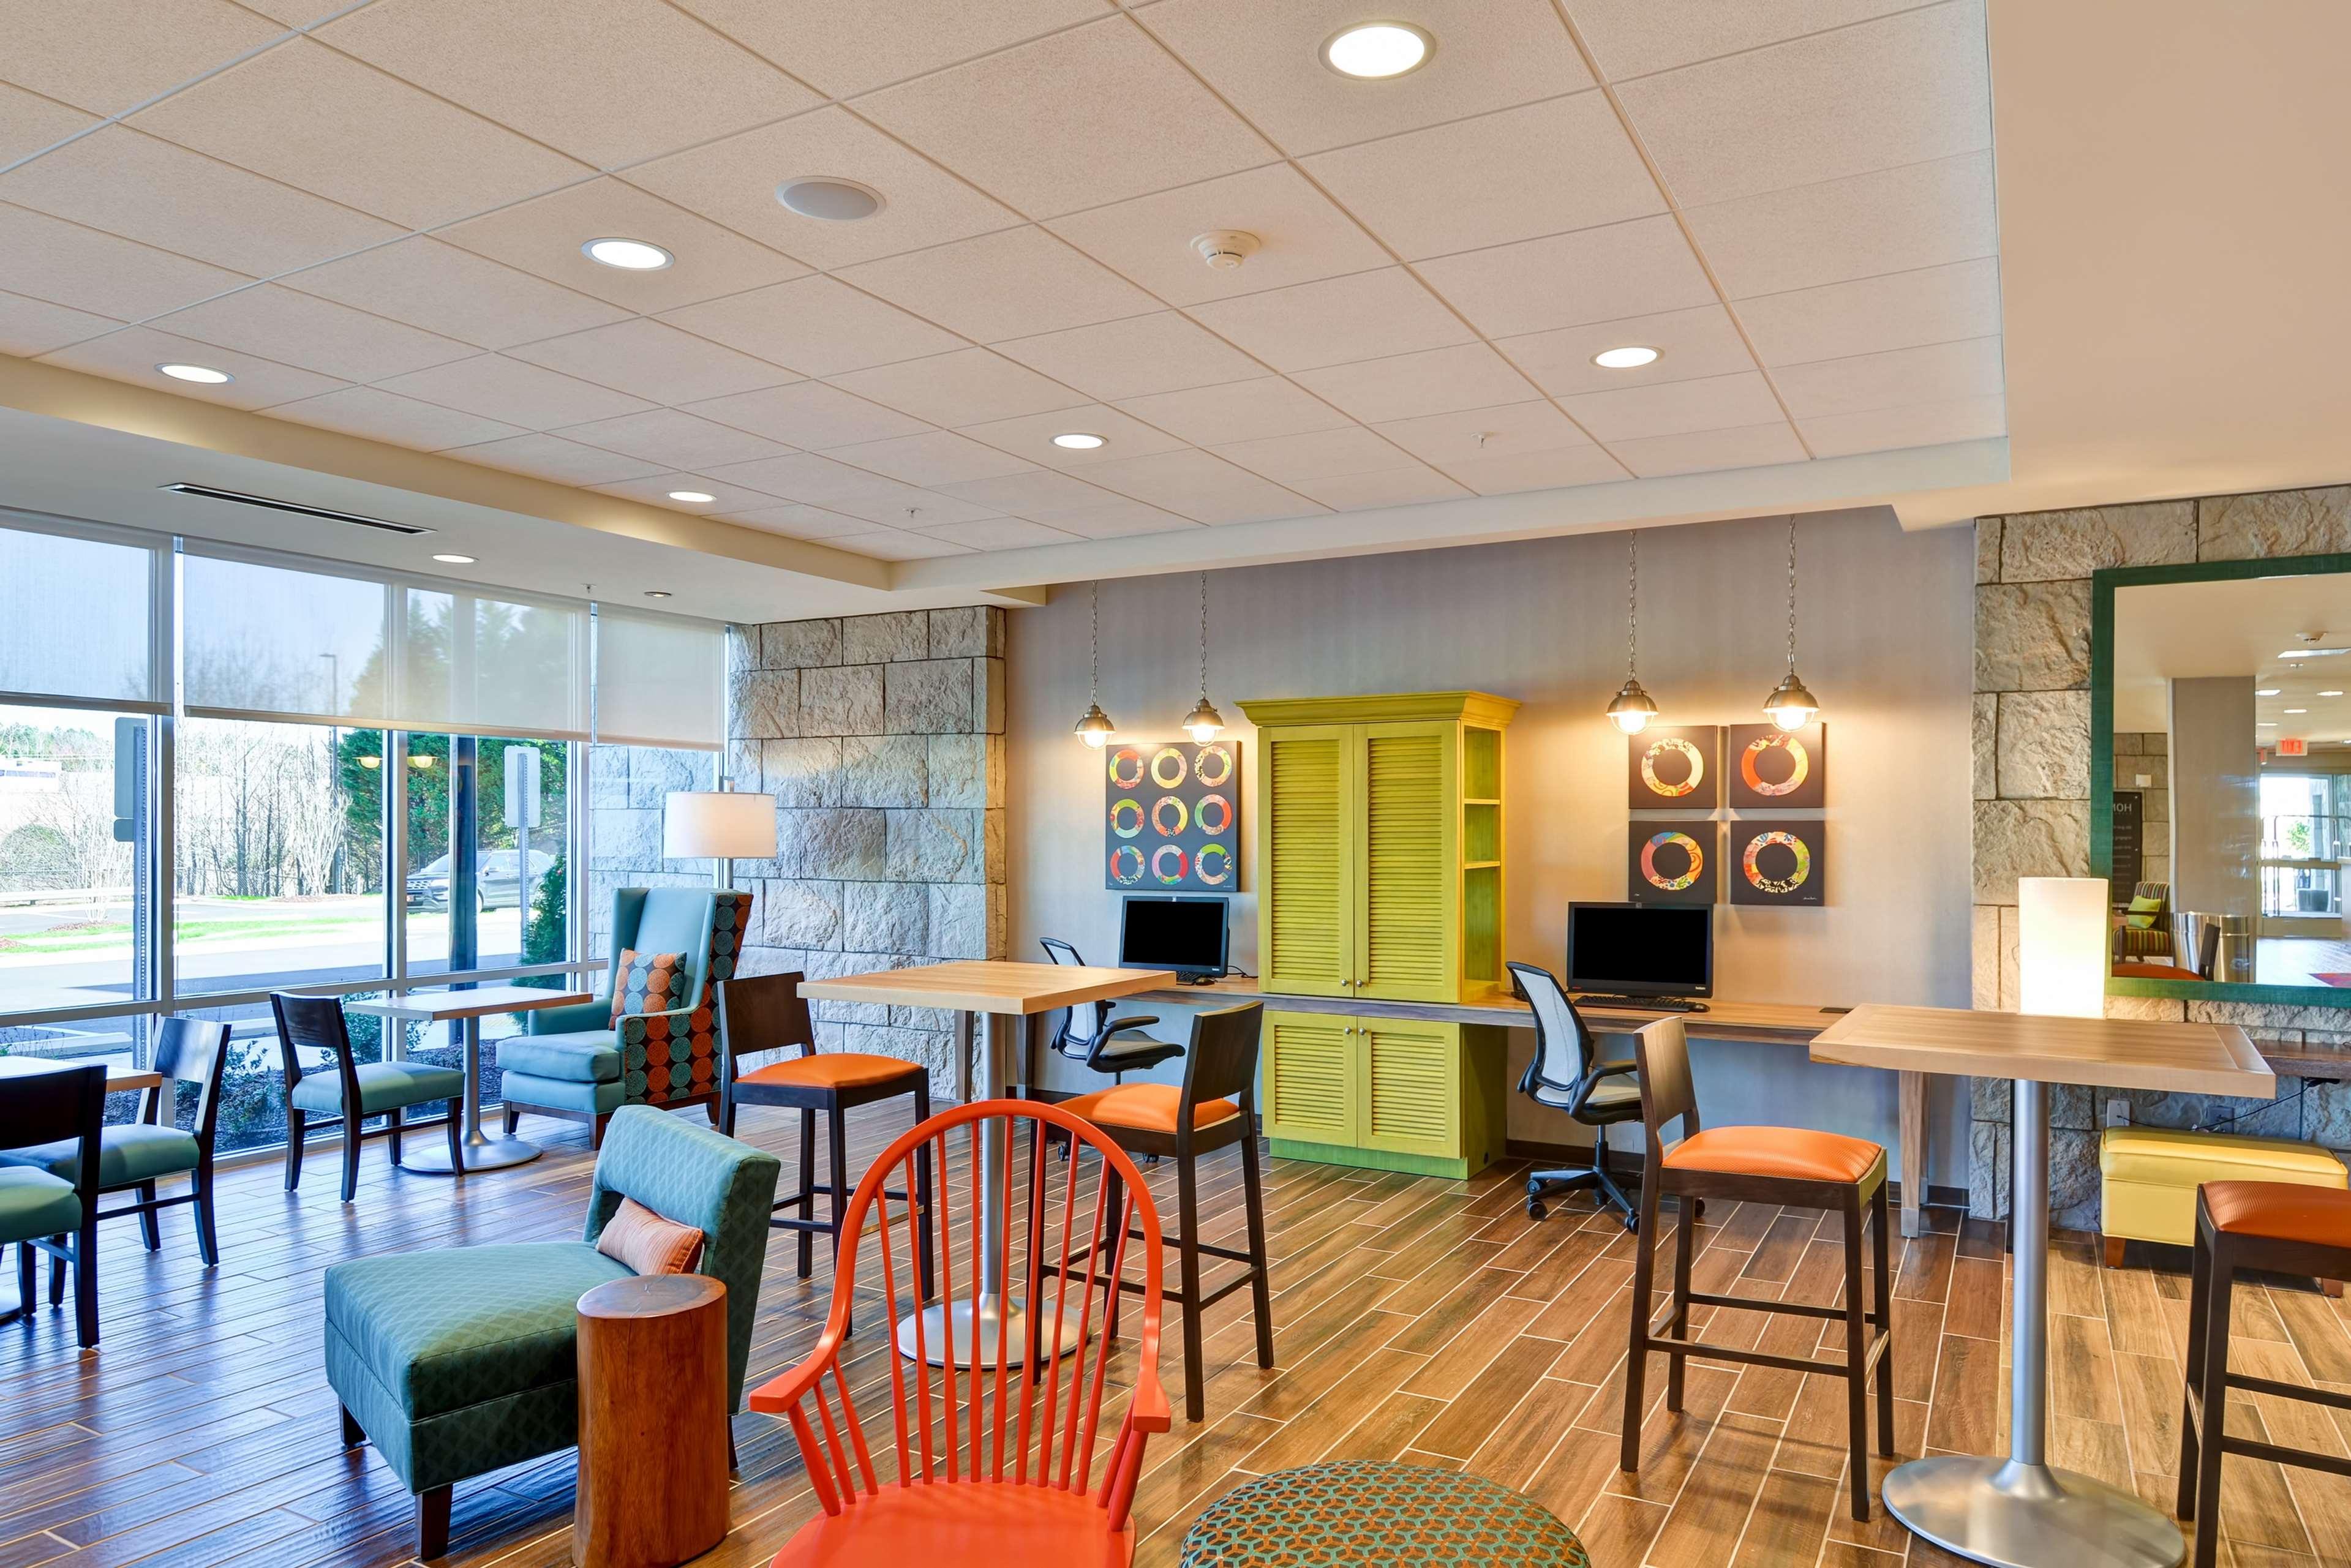 Home2 suites by hilton winston salem hanes mall winston - Hilton garden inn winston salem hanes mall ...